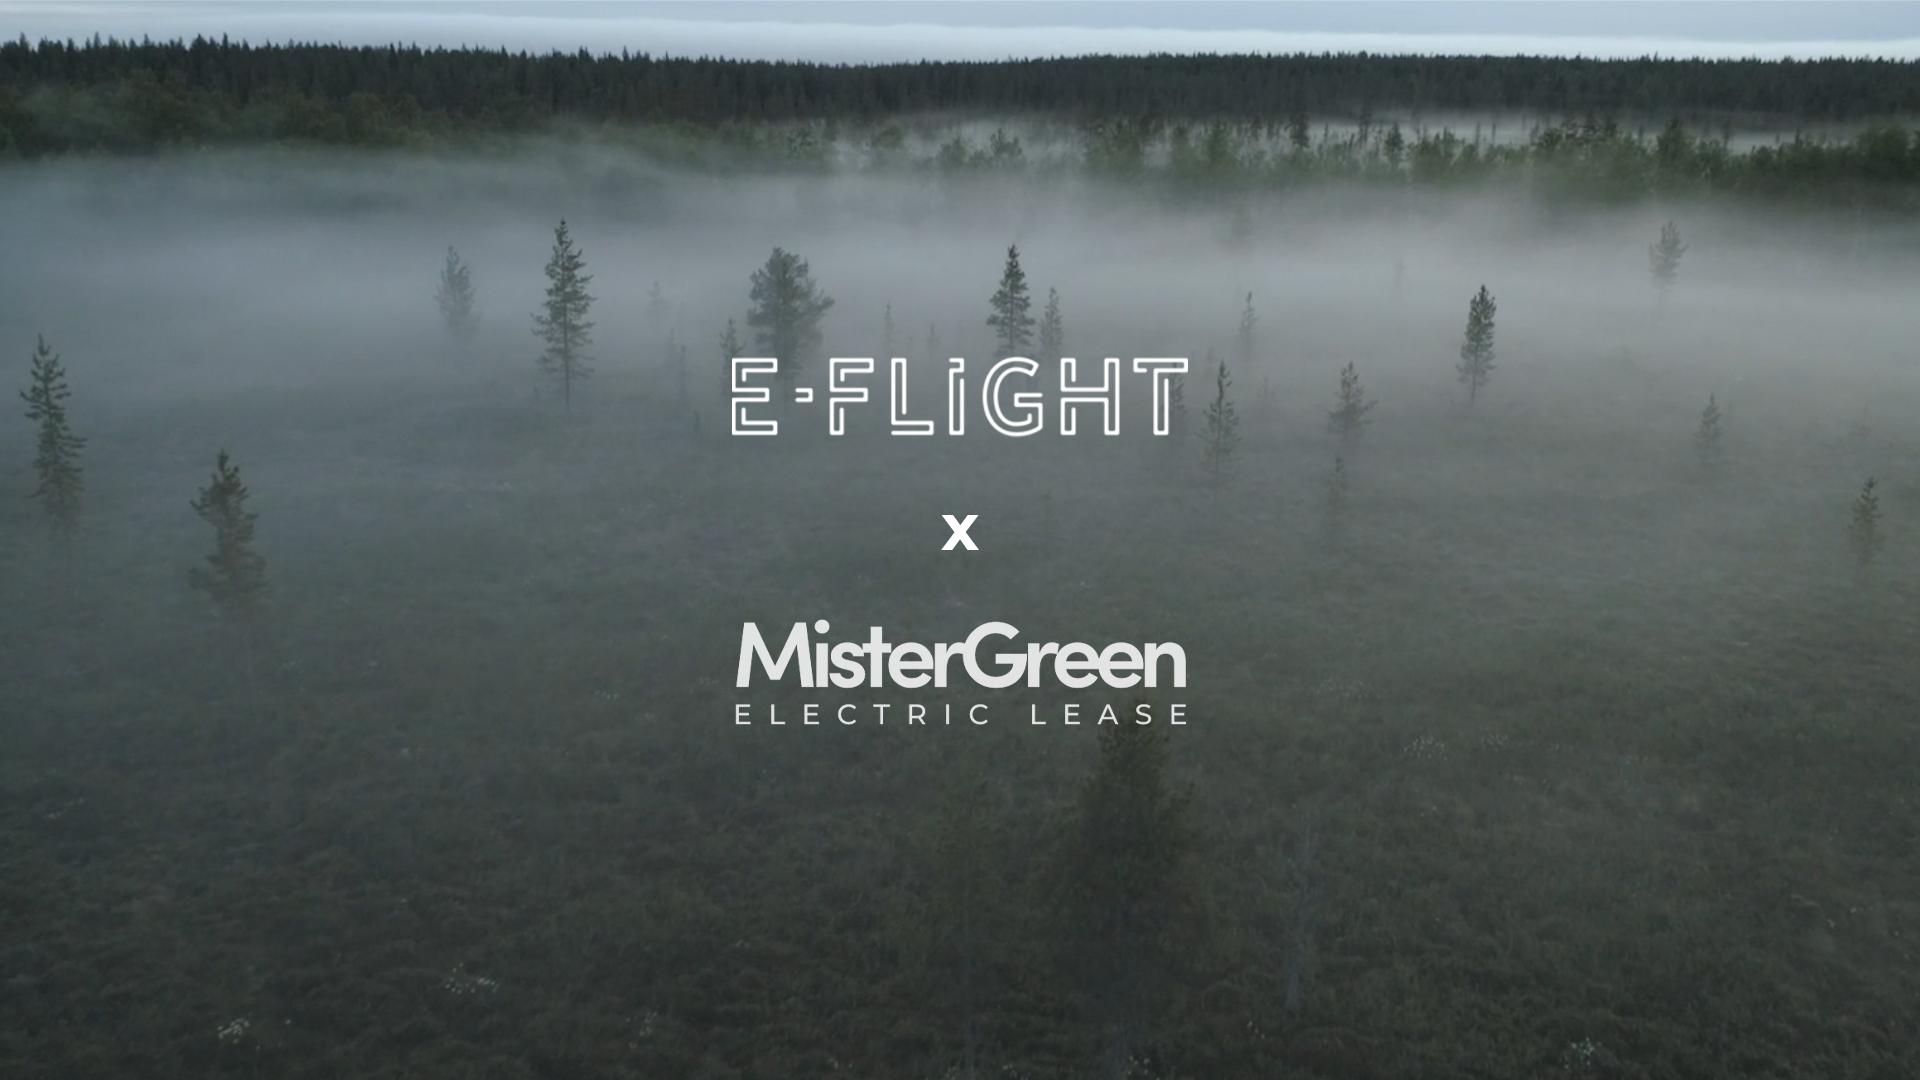 E flight MisterGreen